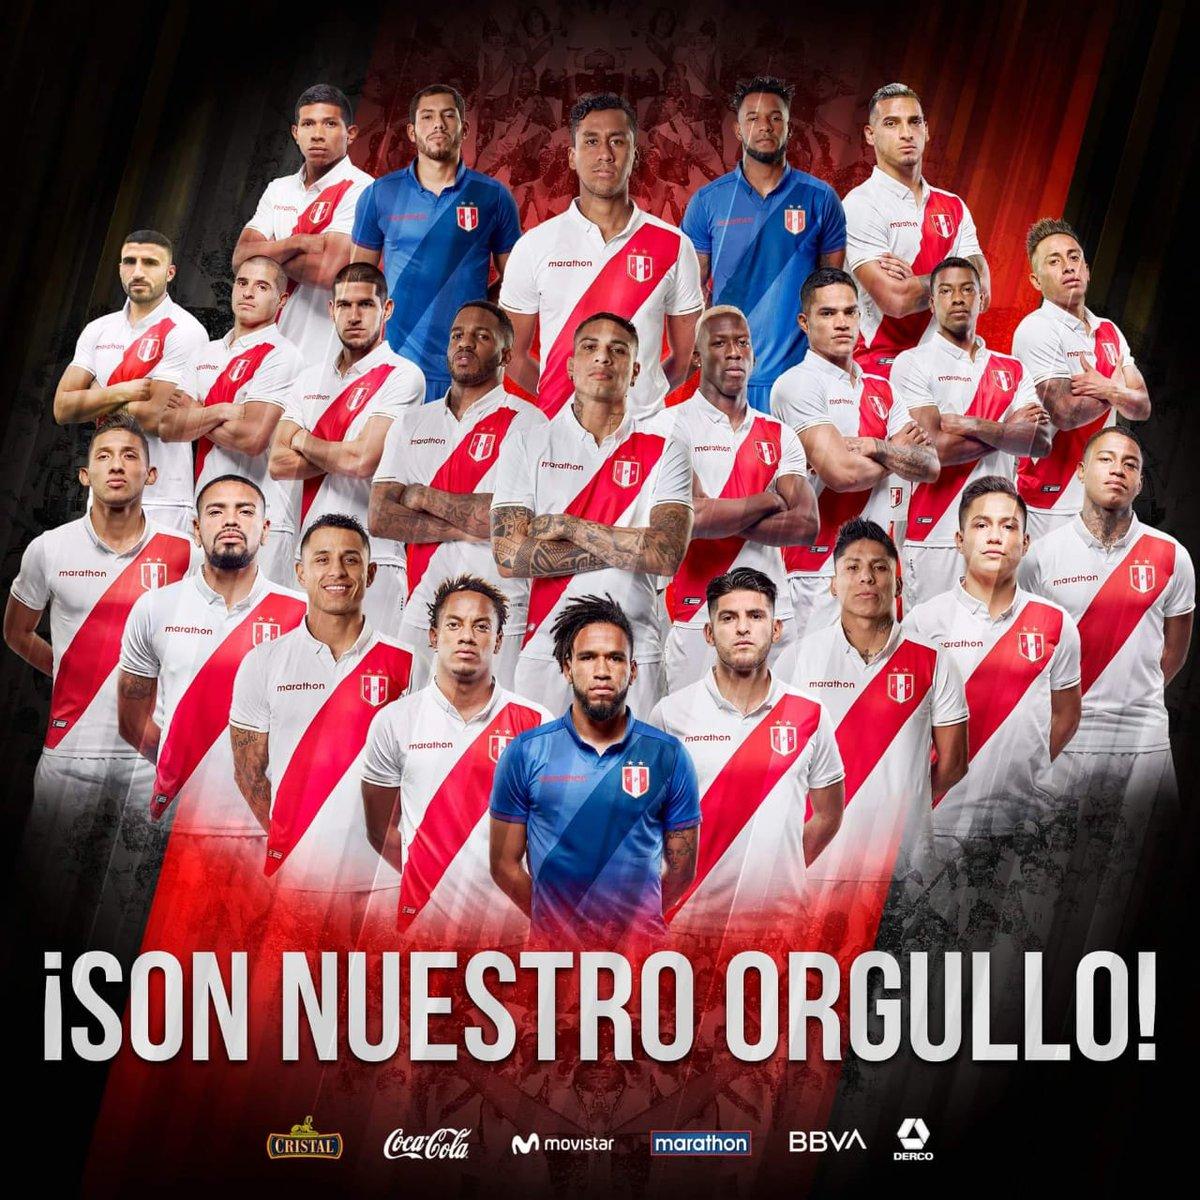 @MINPRODUCCION's photo on #CopaAmerica2019